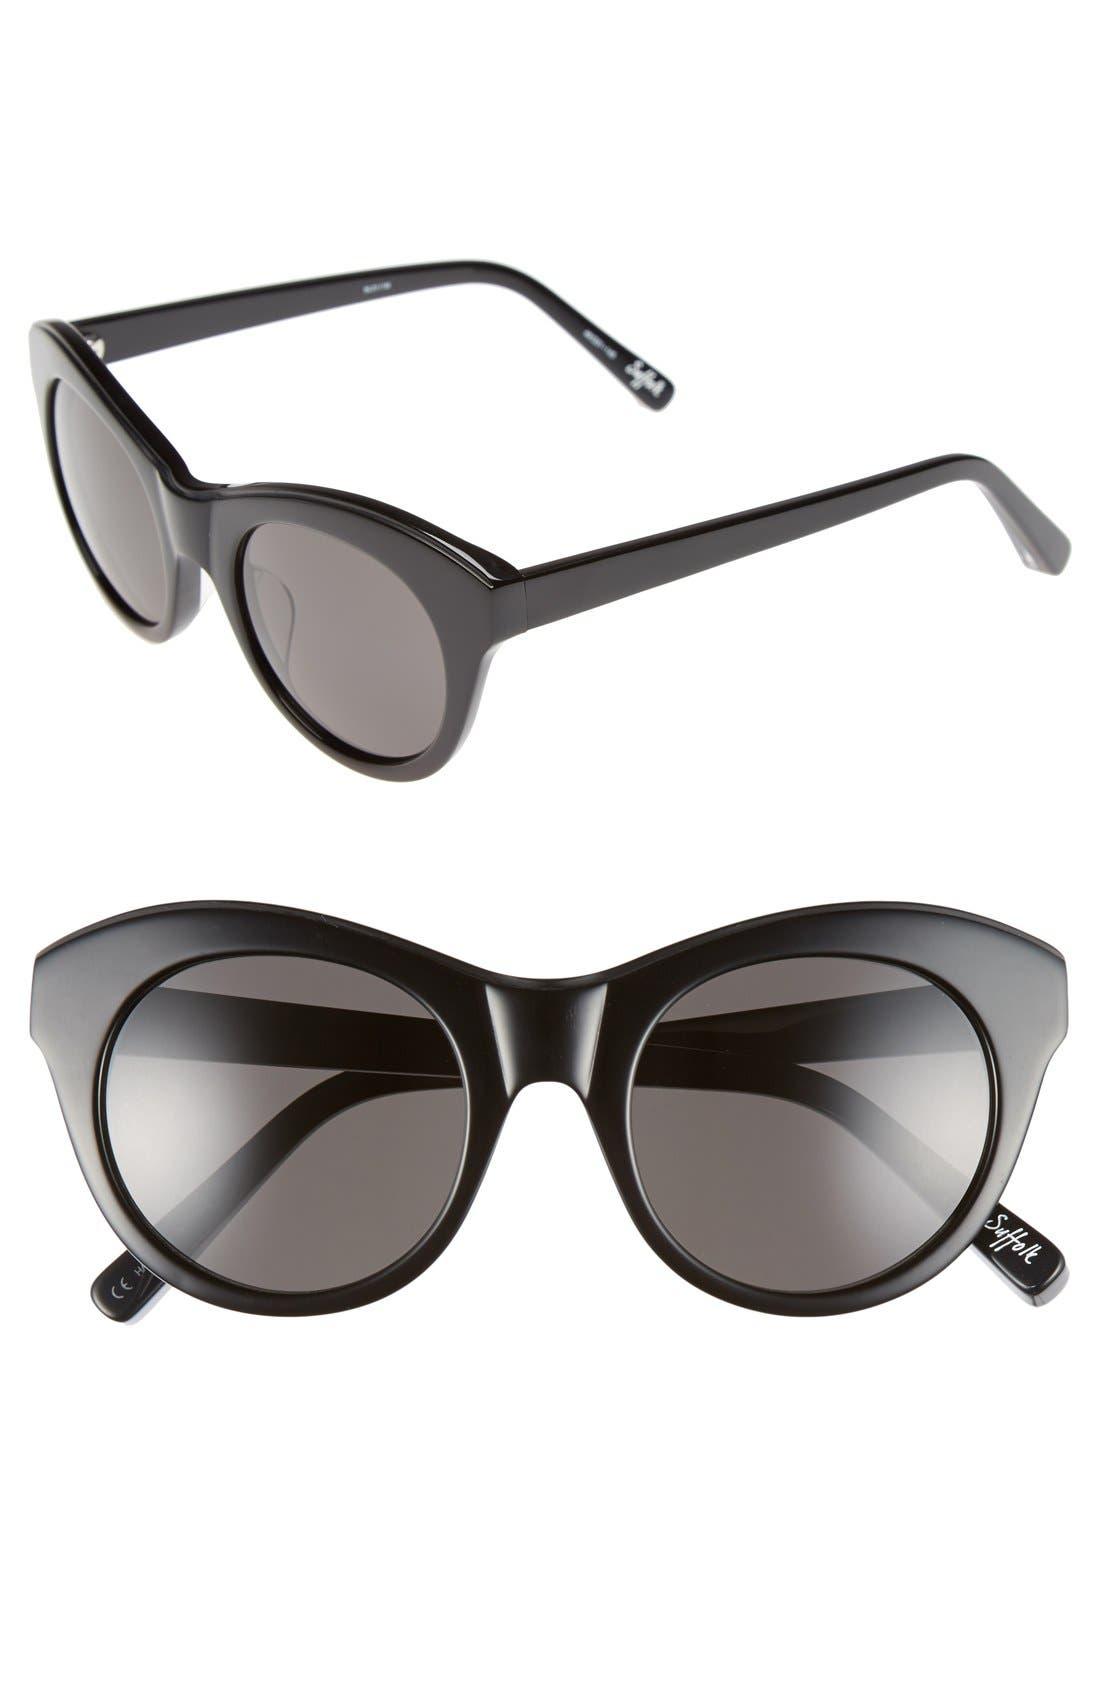 Main Image - Elizabeth and James 'Suffolk' 49mm Cat Eye Sunglasses